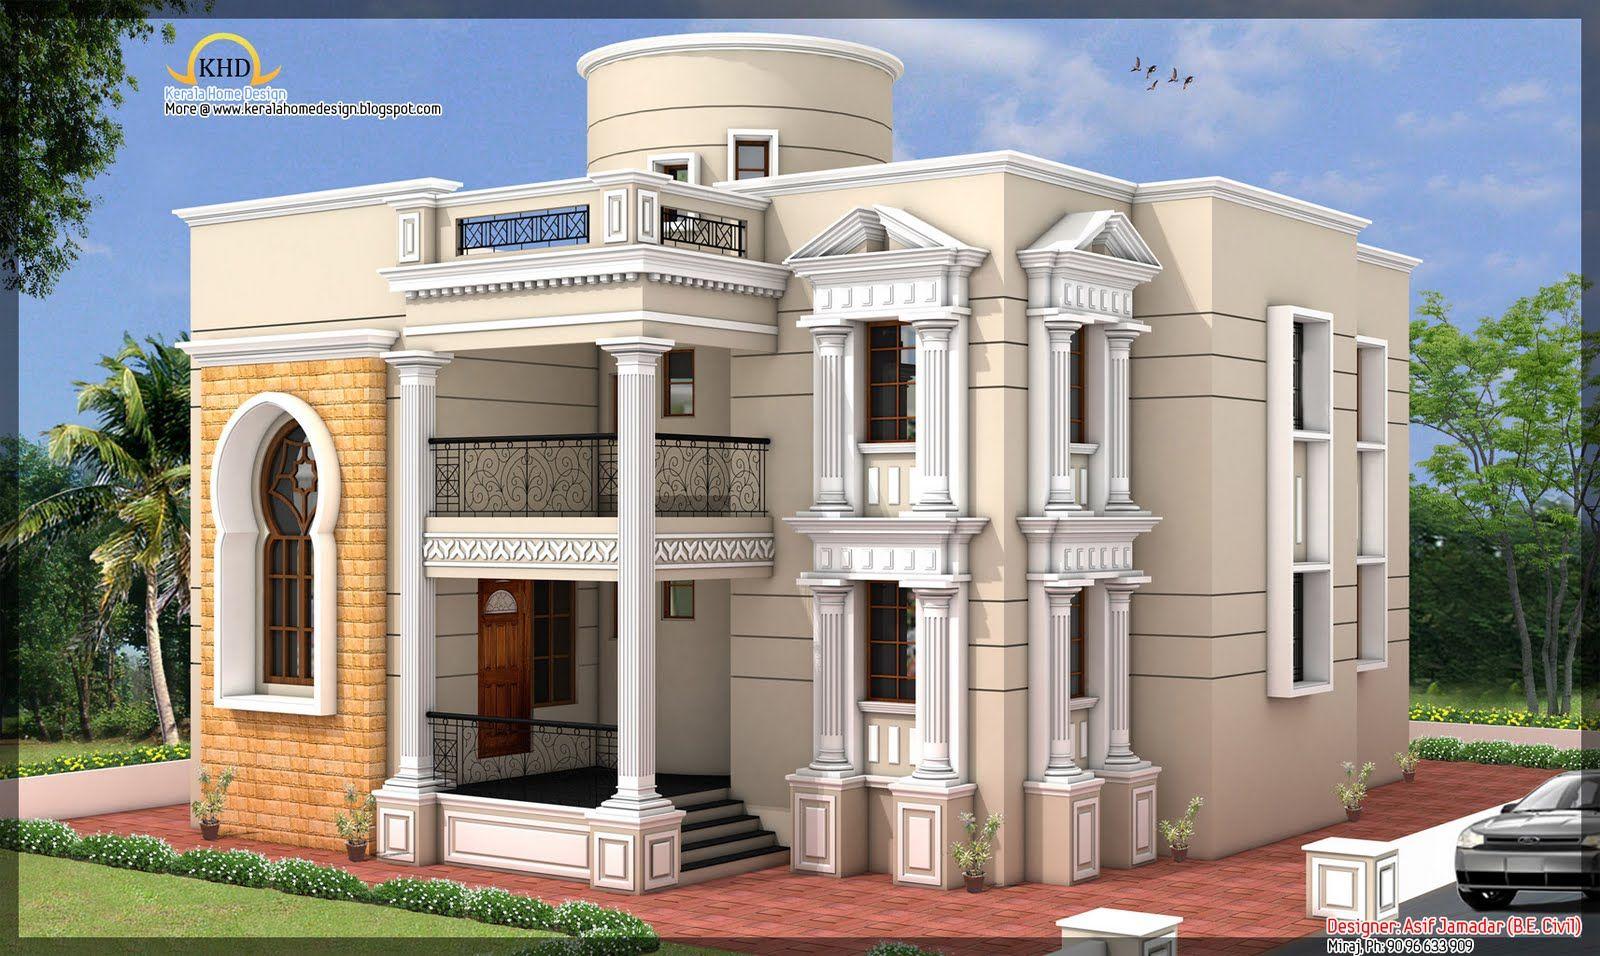 Arabic Home Designs Ground Floor 2121 00 Sq Ft First Floor 1760